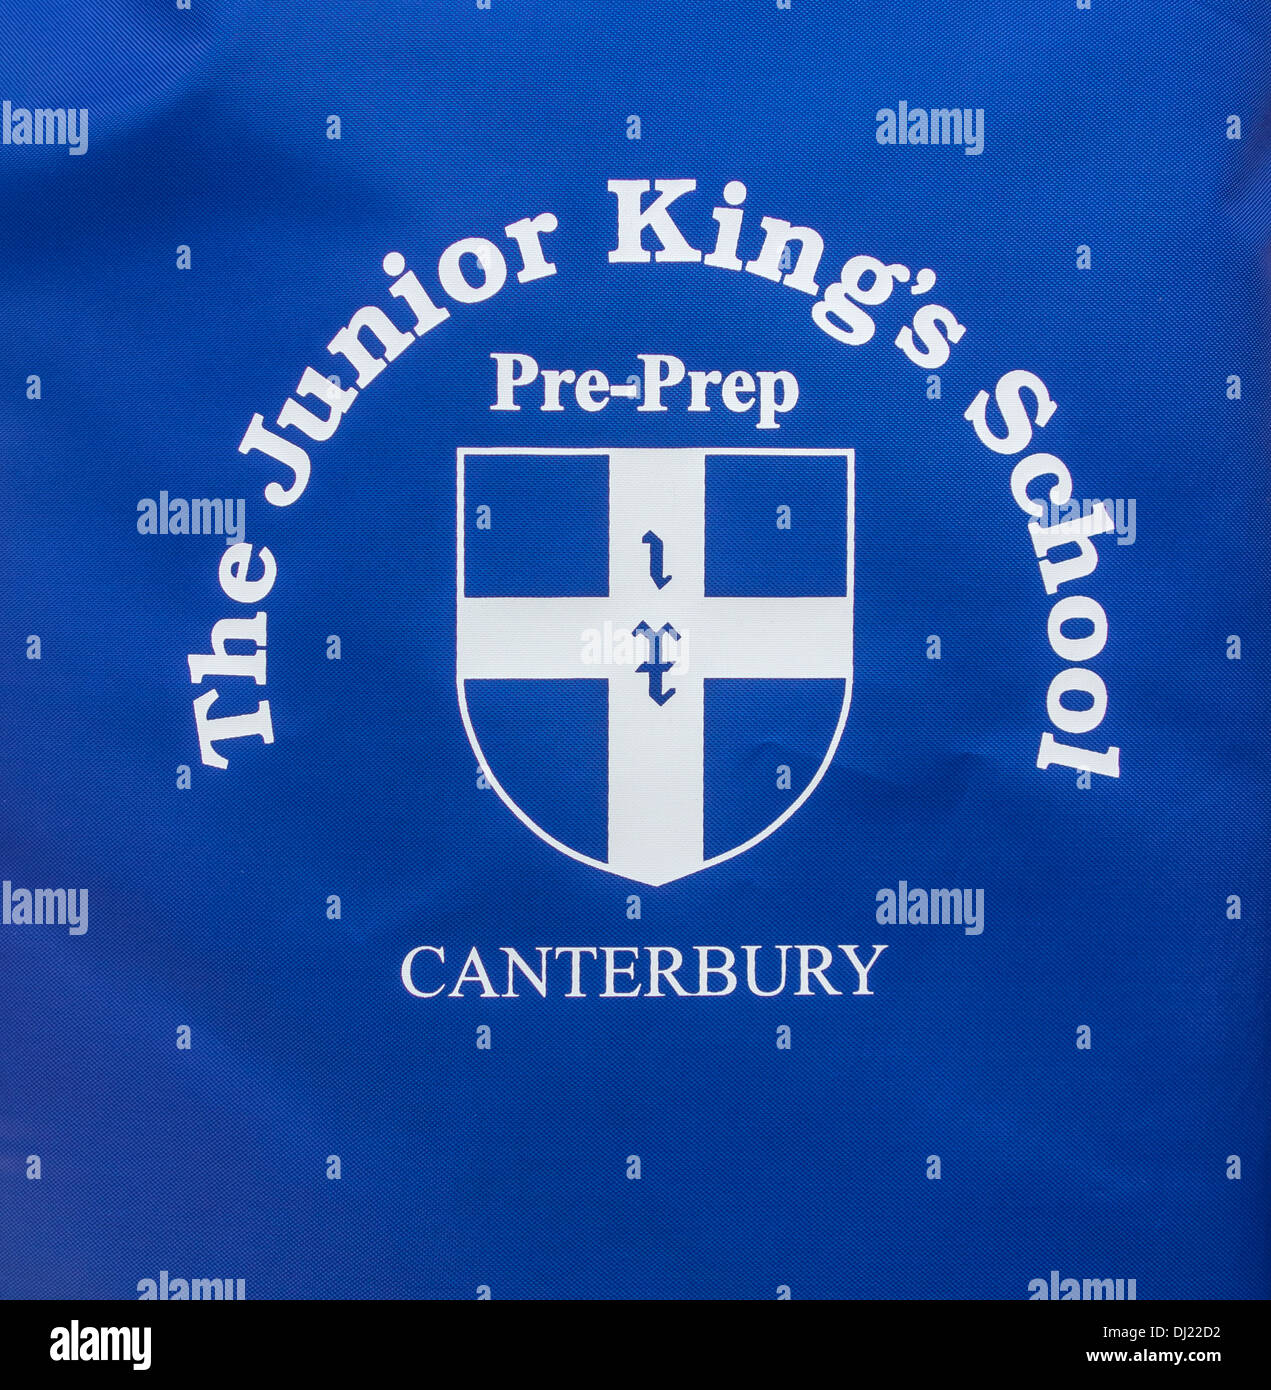 Junior Kings School Pre Prep Logo Canterbury - Stock Image